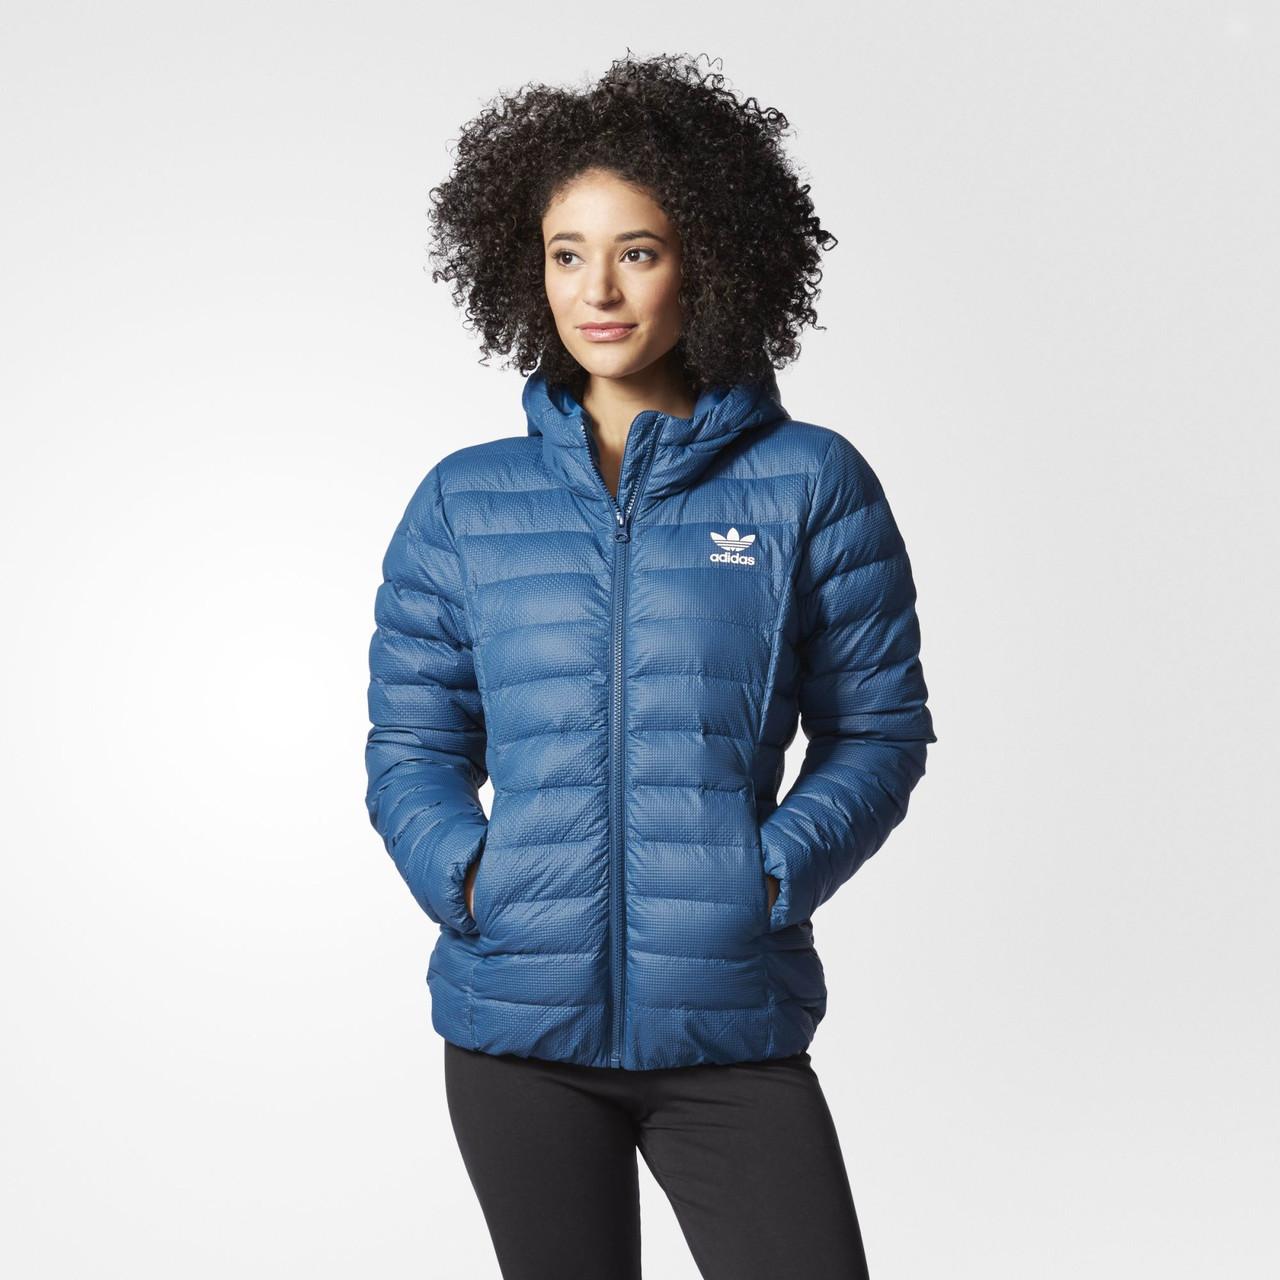 ab46706a5f9b Женская куртка Adidas Originals Slim (Артикул  AY4788) - Интернет-магазин  «Эксперт